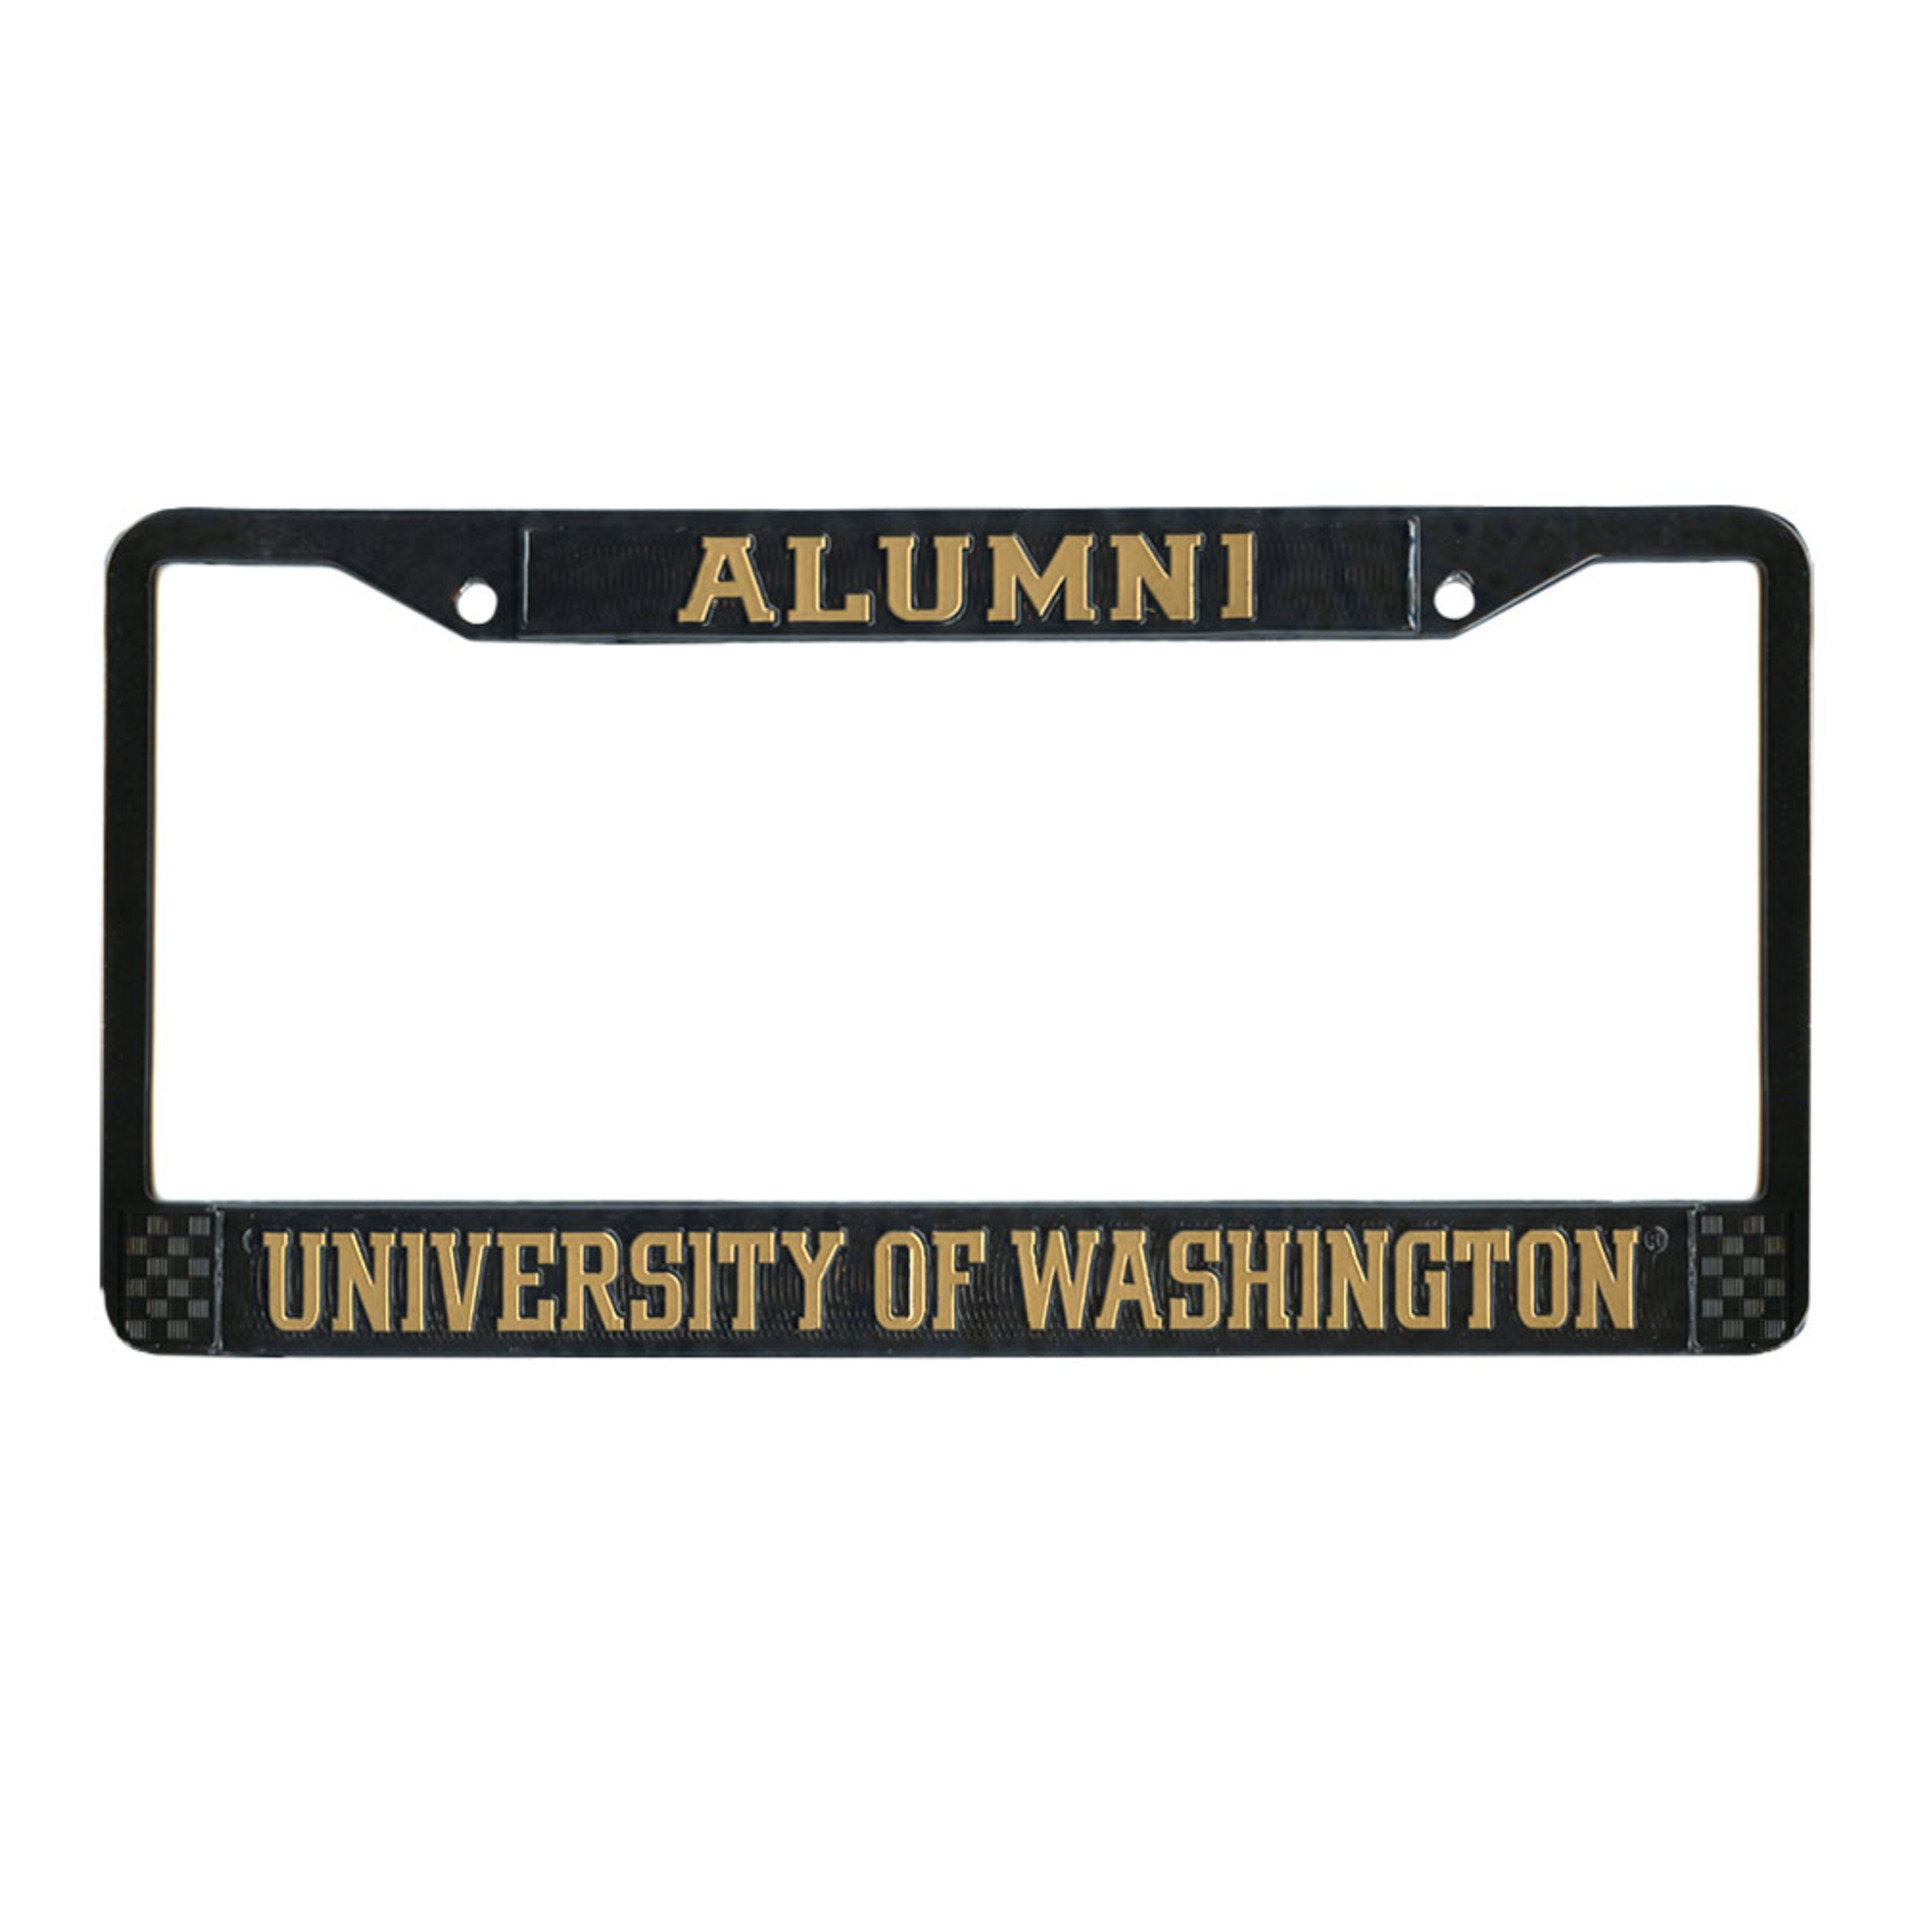 University of Washington Alumni License Plate Frame Black